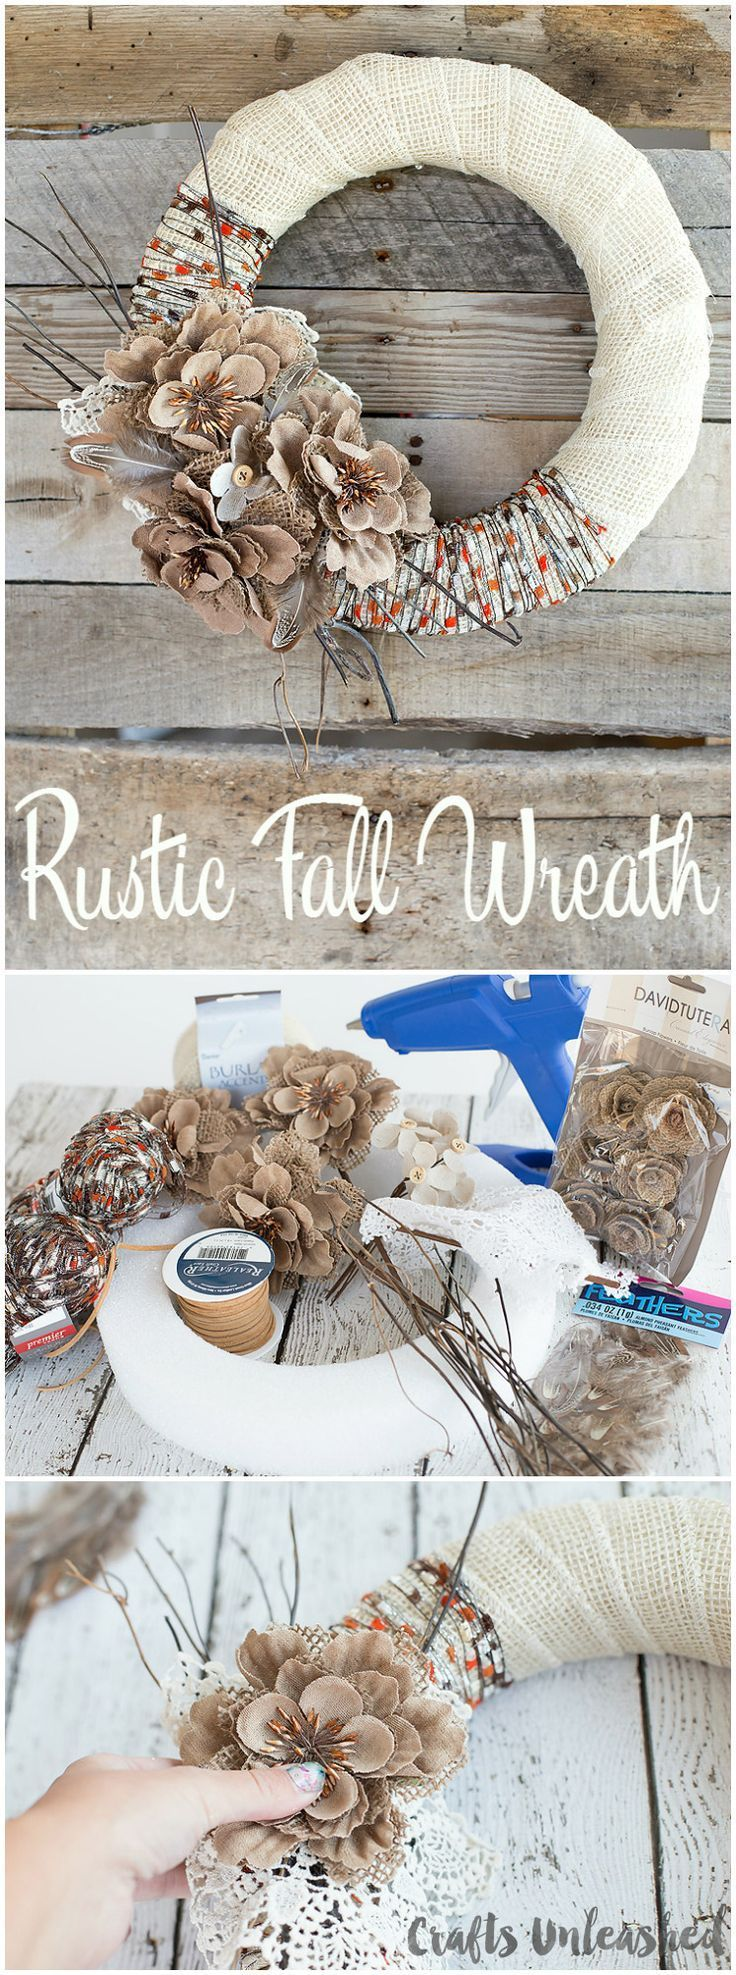 Fall Wreath DIY Project Idea: Burlap & Yarn - Consumer Crafts                                                                                                                                                                                 More